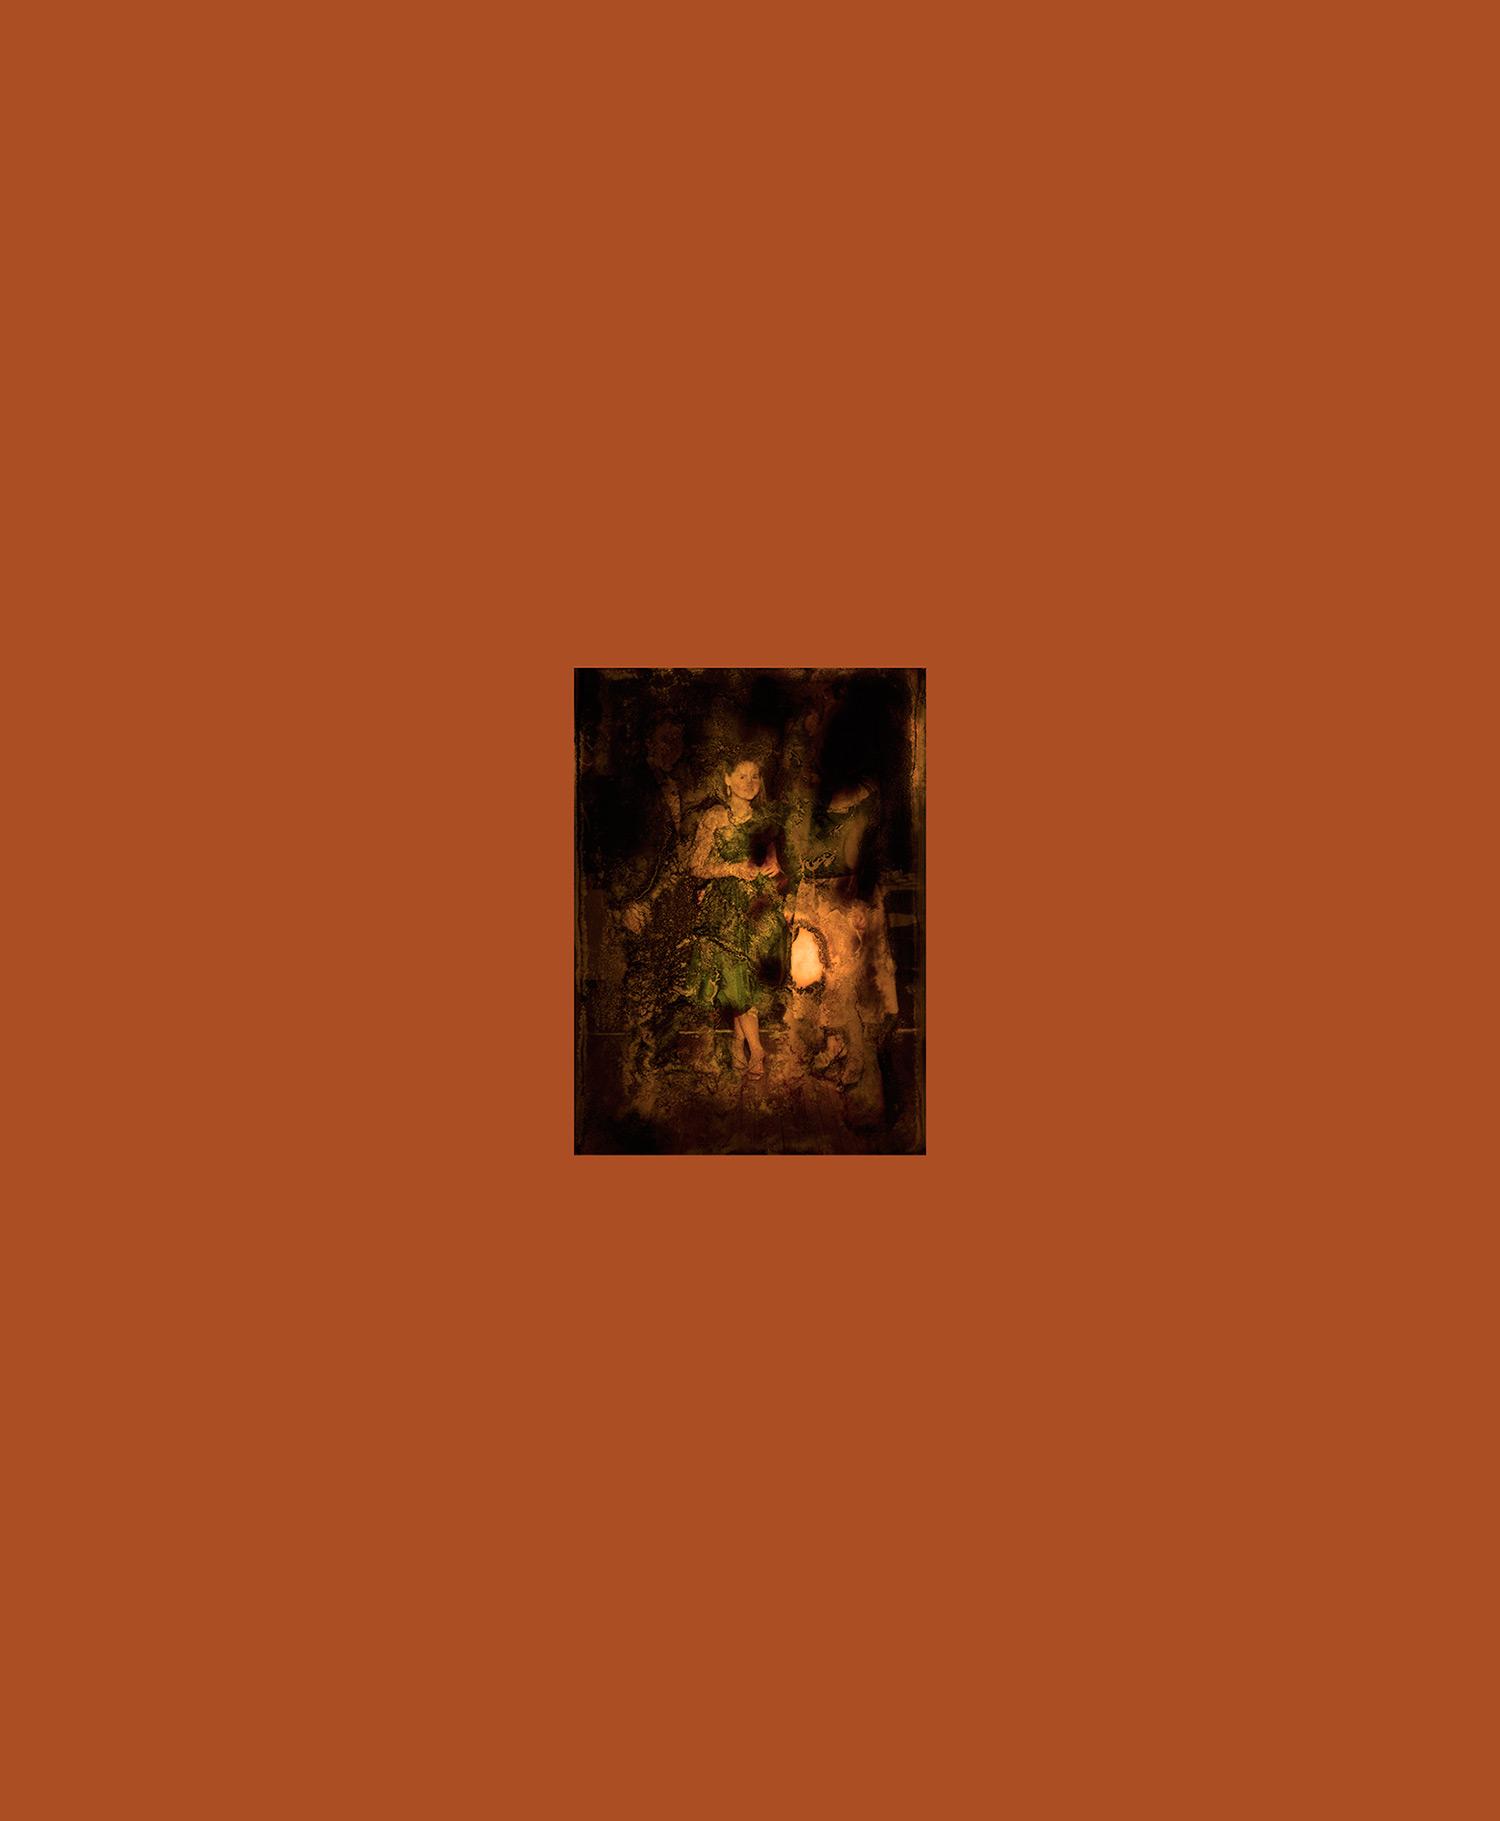 Anonymous (flooded album); burnt sienna